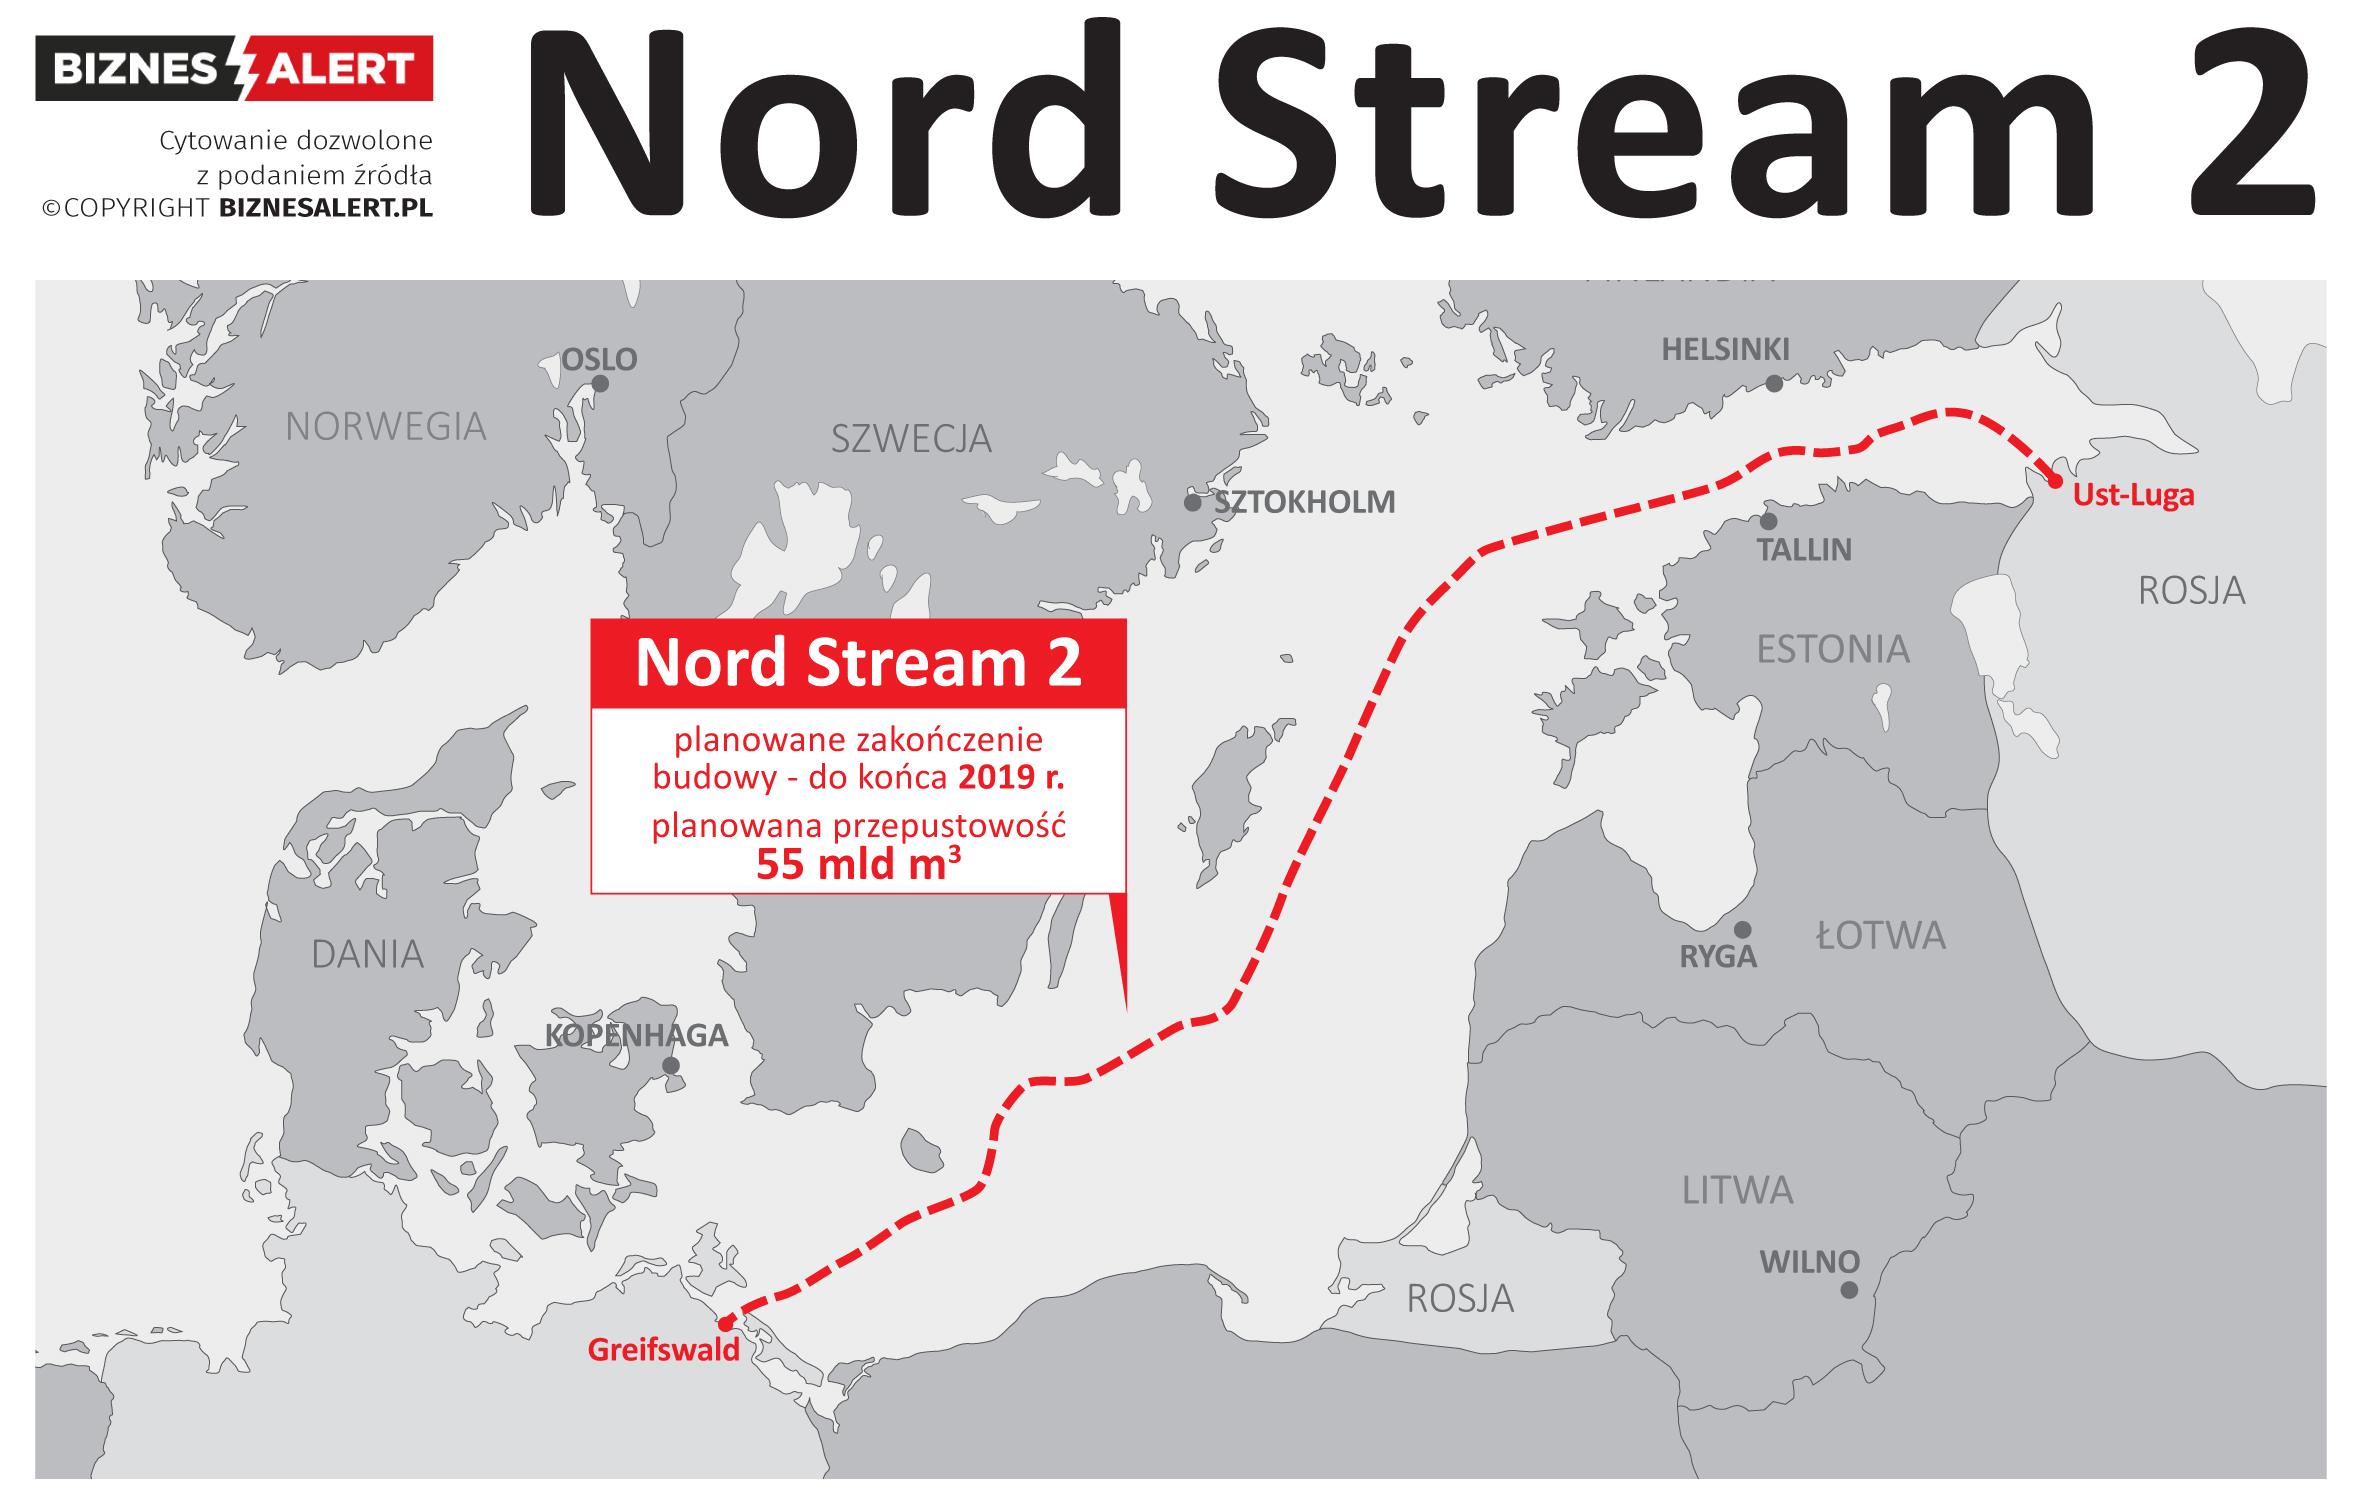 North Stream 2